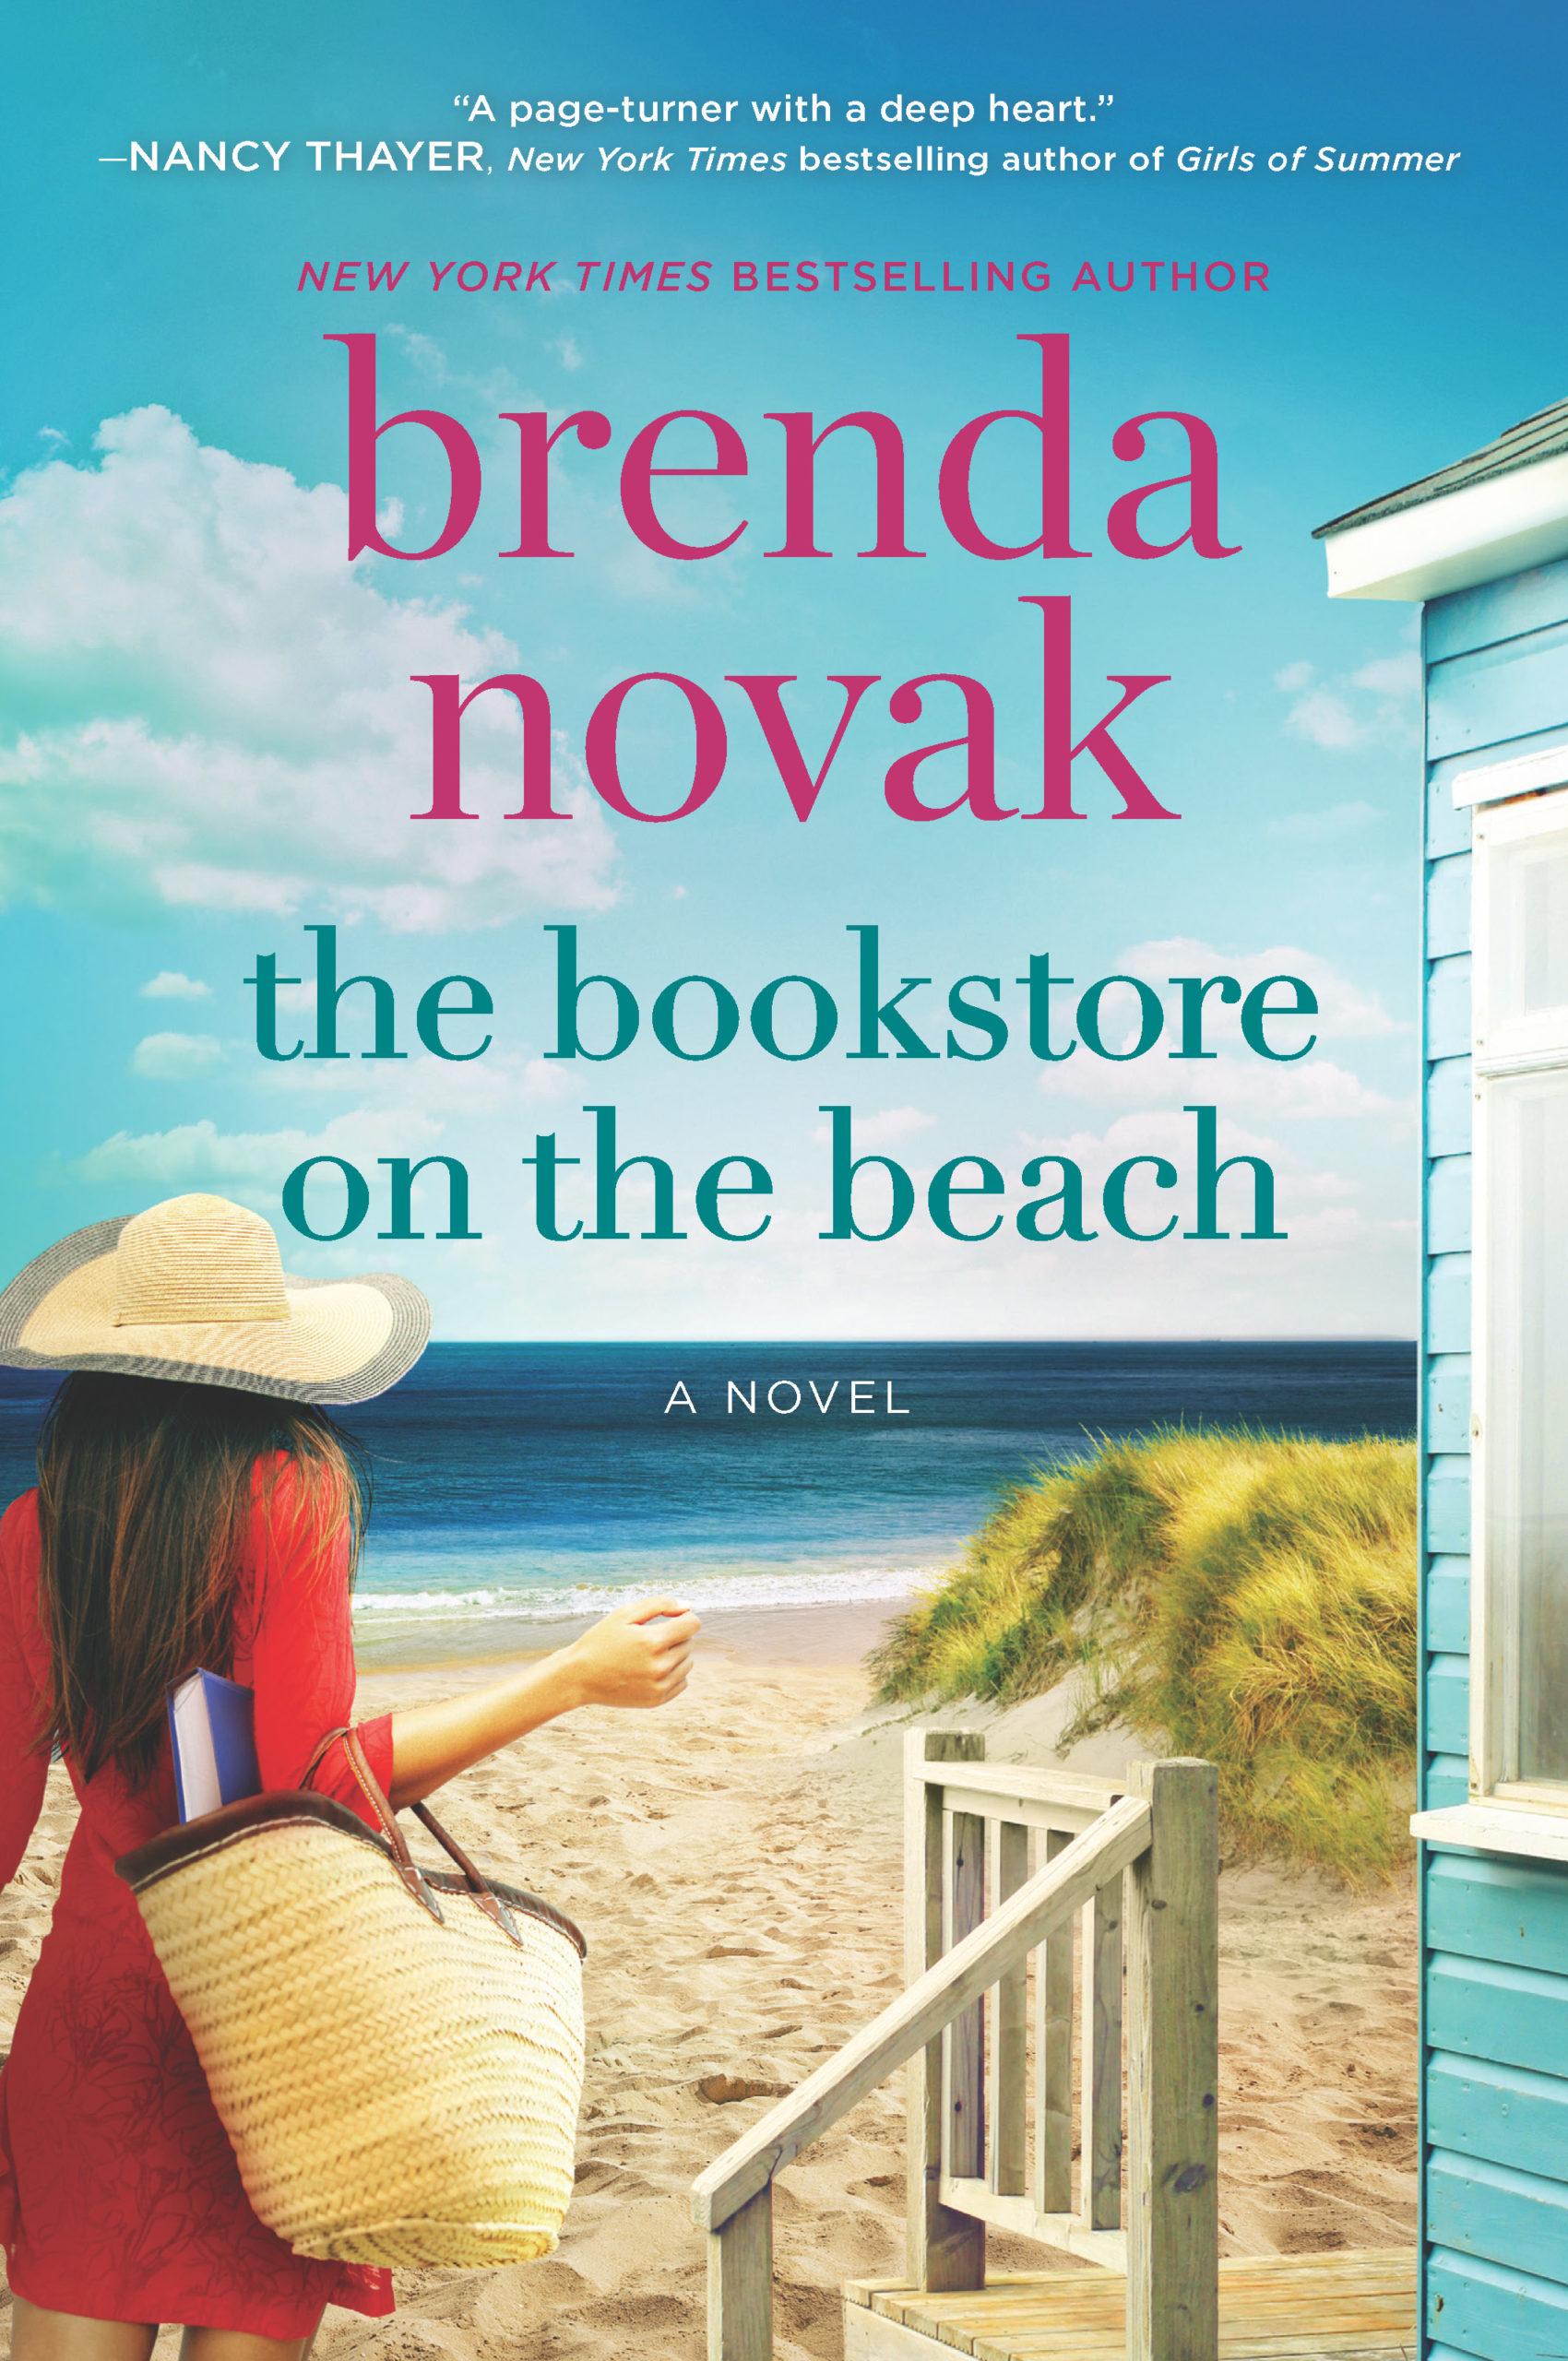 BookstoreOnTheBeach